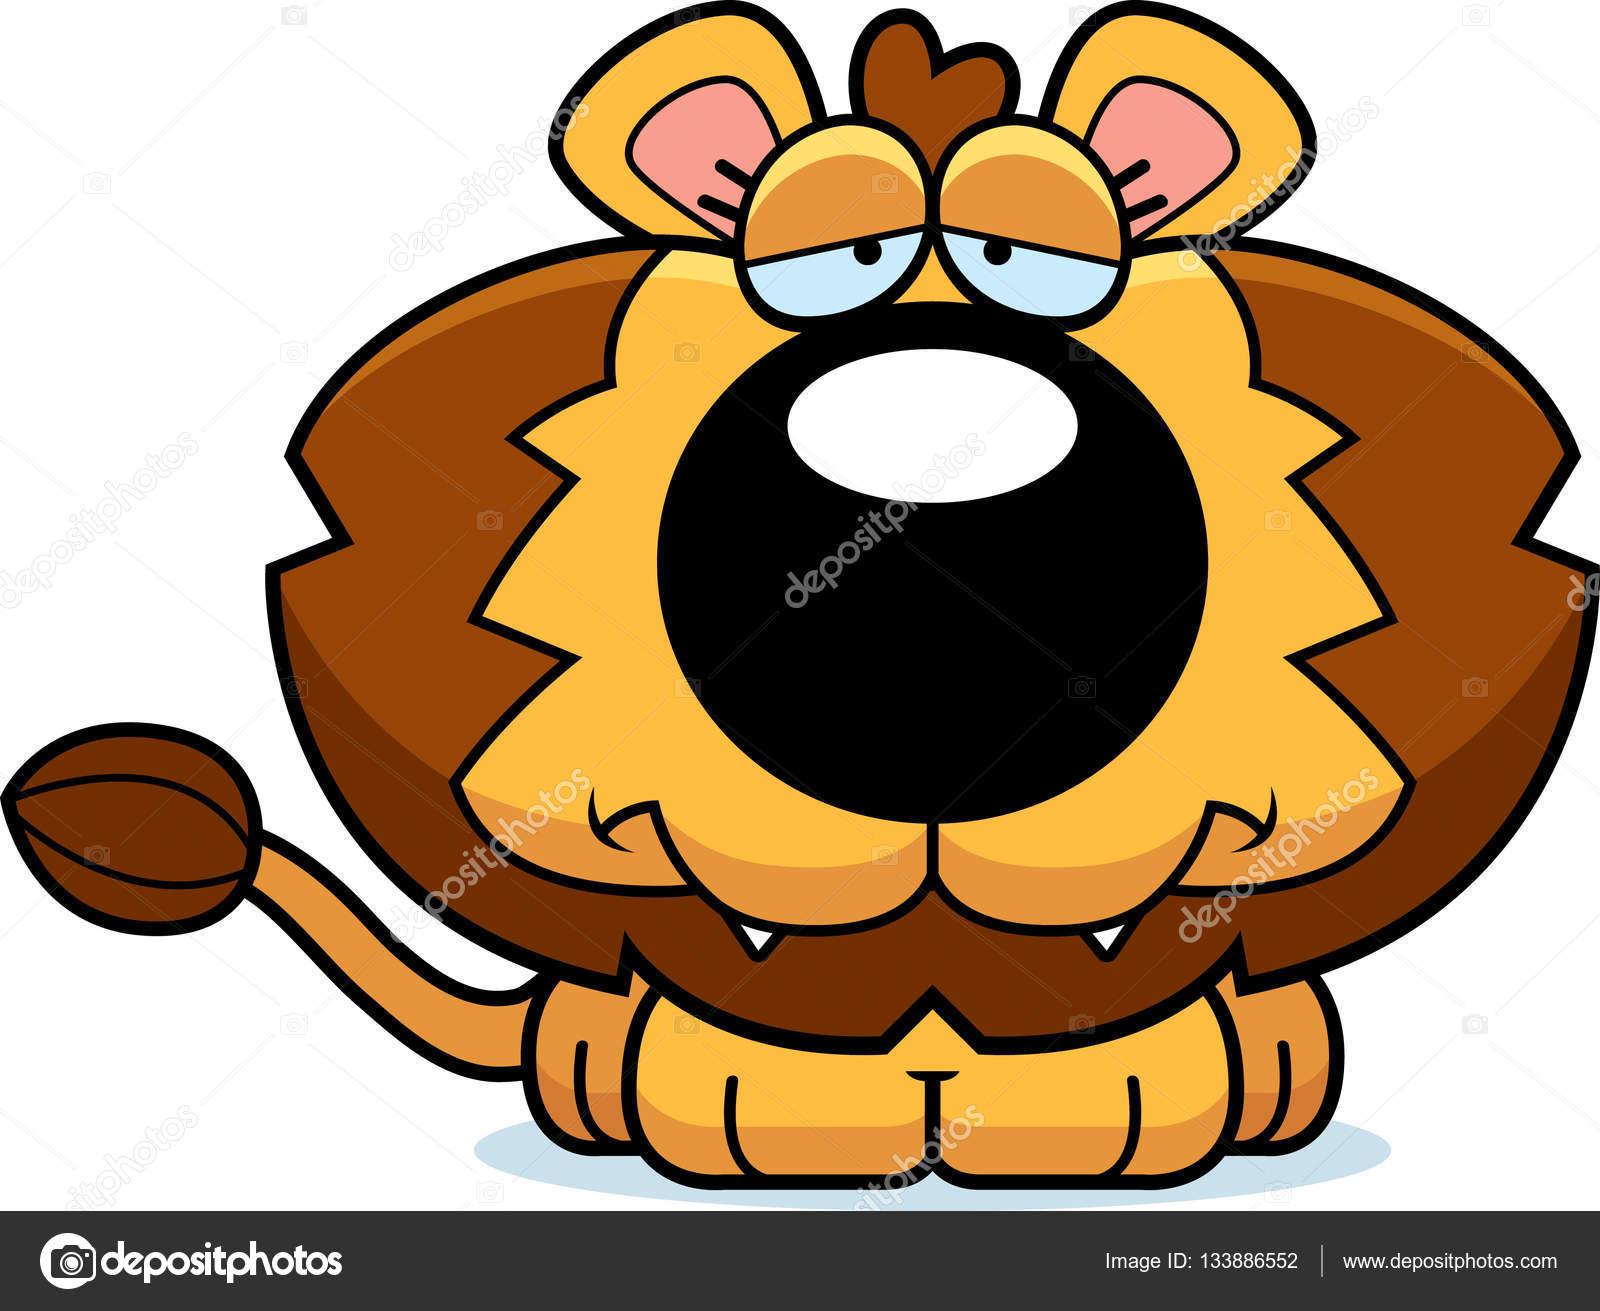 cartoon sad lion cub stock vector cthoman 133886552 rh depositphotos com lion cub clipart black and white cartoon lion cub clipart